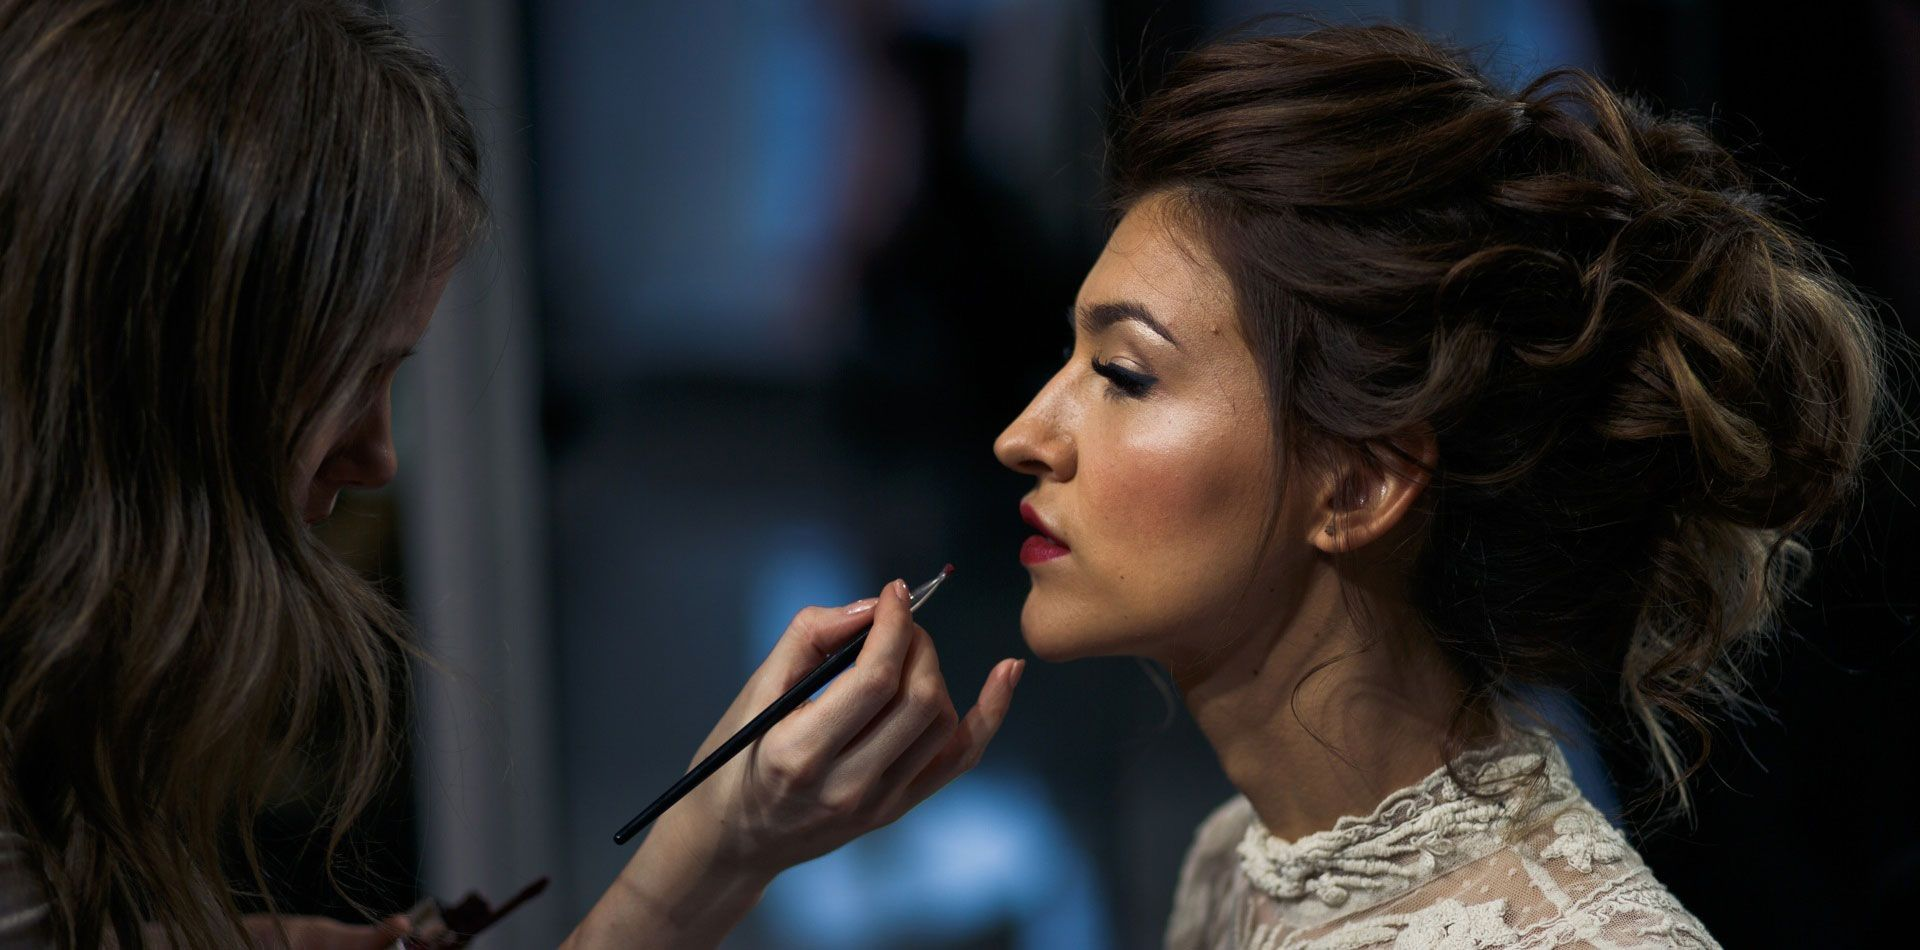 Орнелла Шигапова макияж